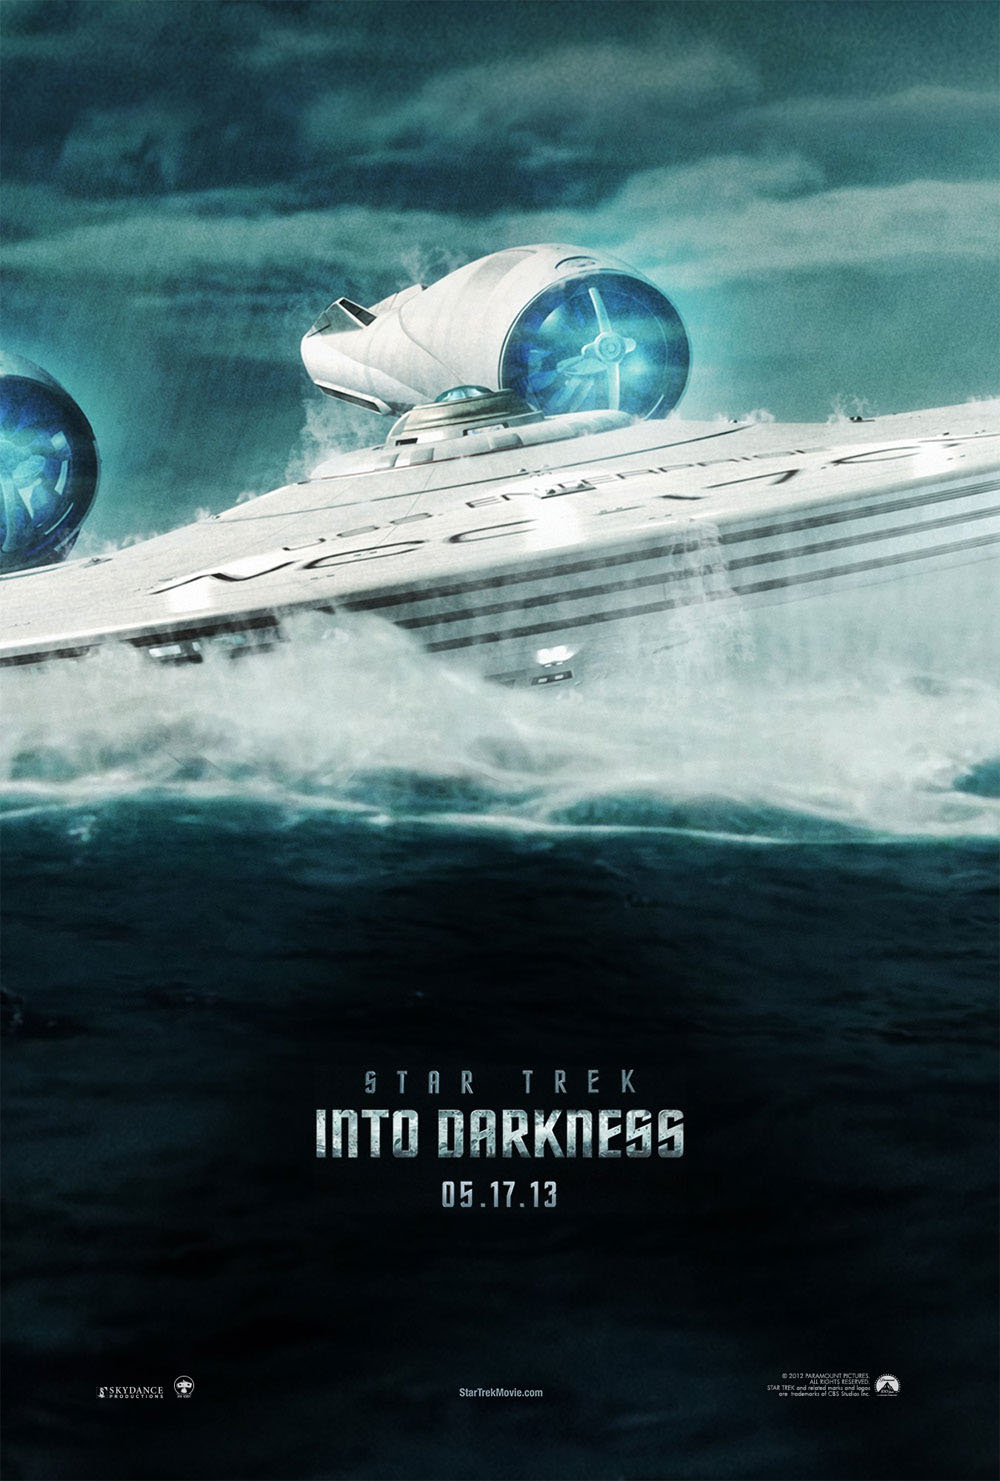 Movie Posters Star Trek Star-trek-into-darkness-poster